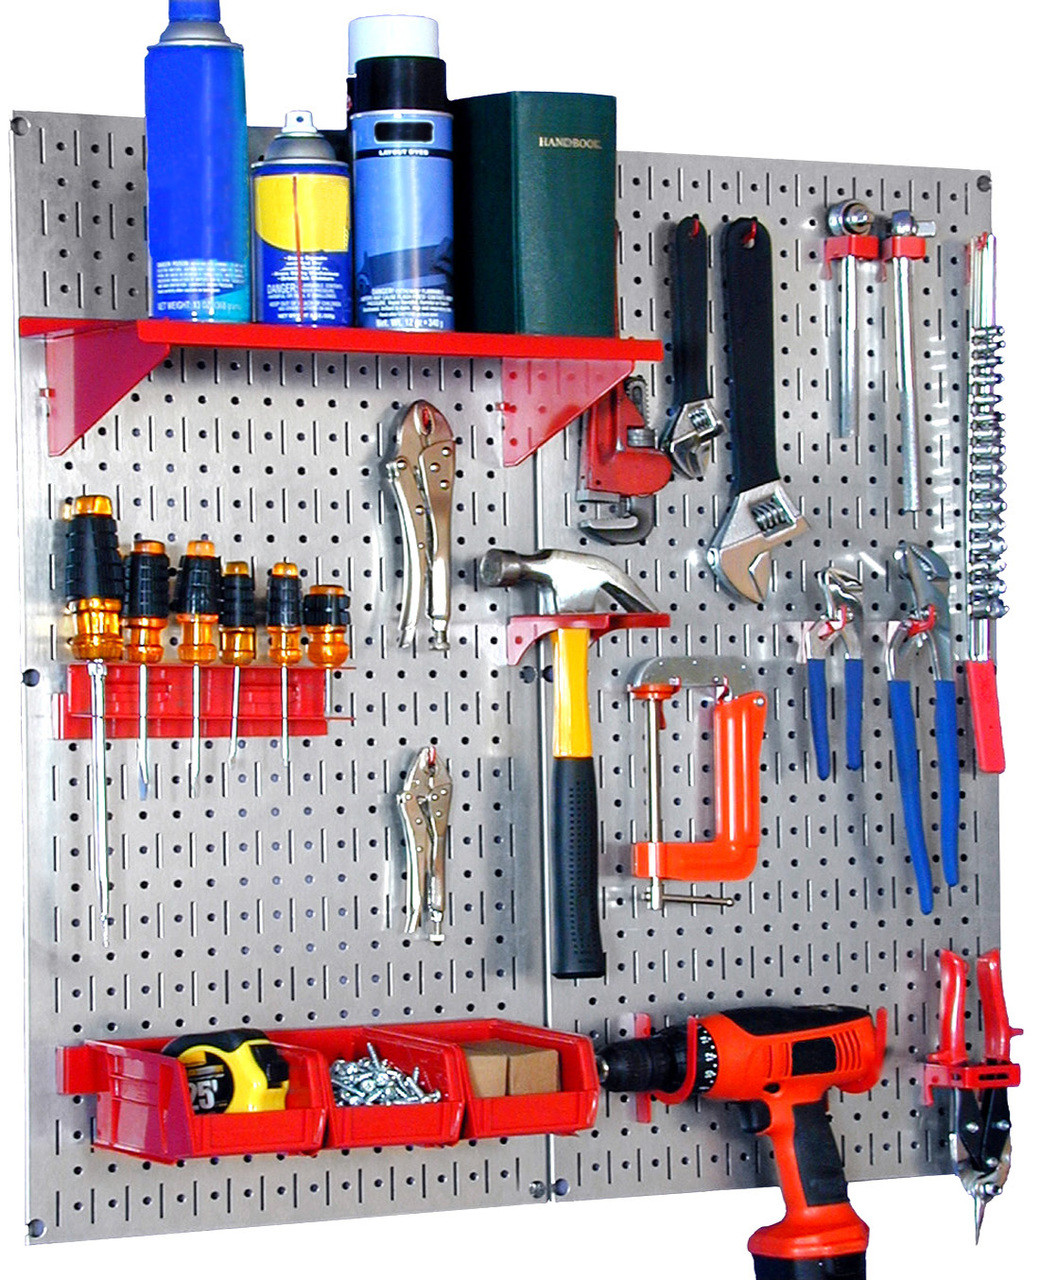 Pegboard tool storage photos